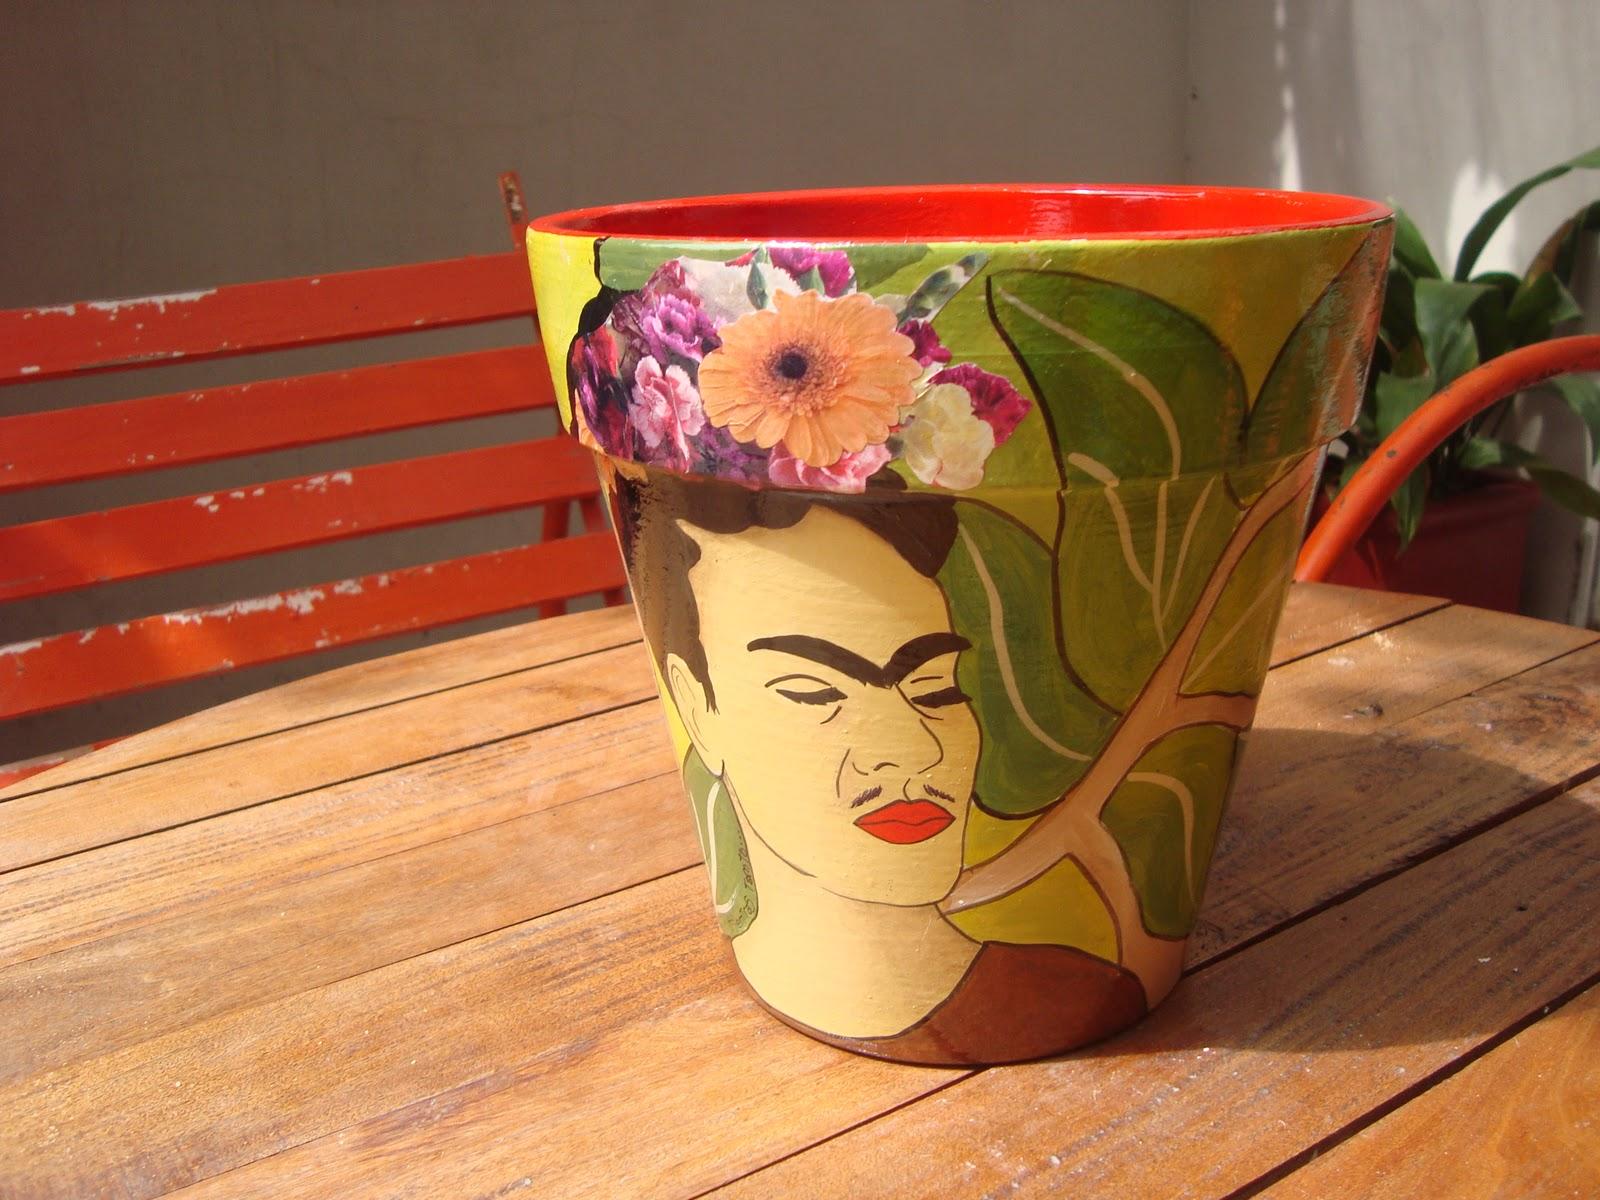 Imagenes De Frida Kahlo Animada Para Colorear: Frida Kahlo Dibujo Para Colorear Animada